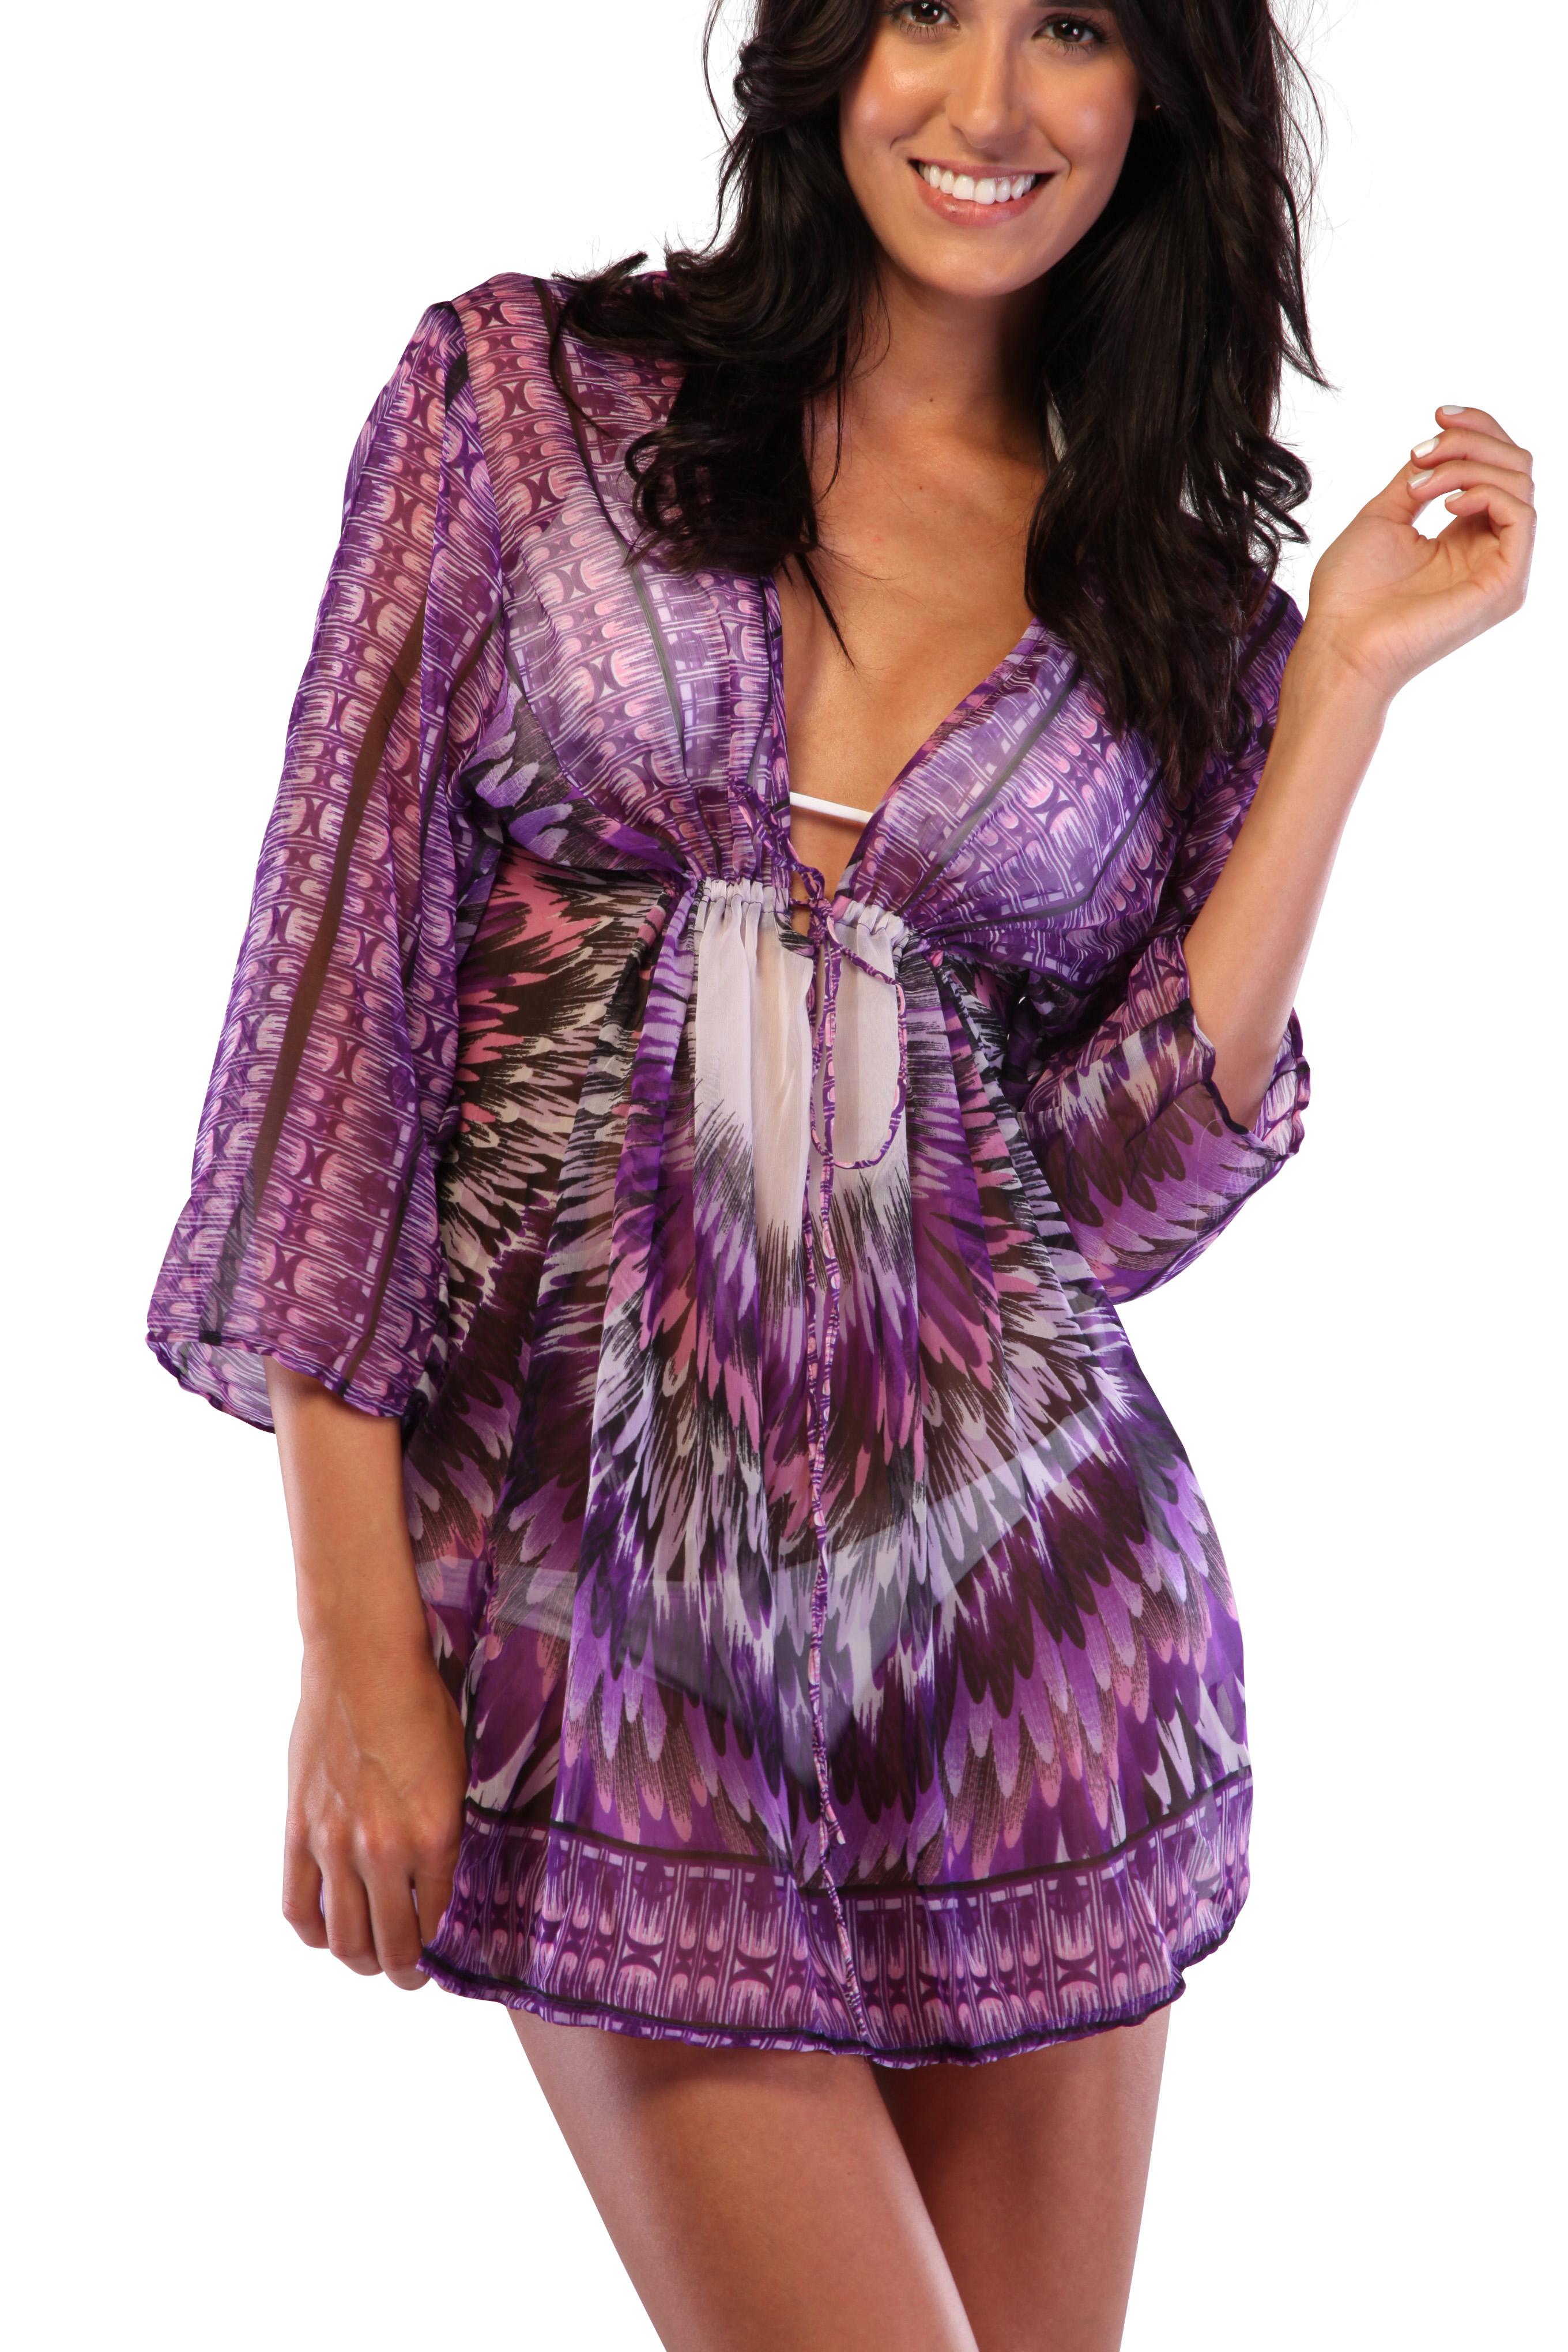 Ingear Beach Cover Up Drawstring Poncho Summer Fashion Print Tunic Top Beachwear